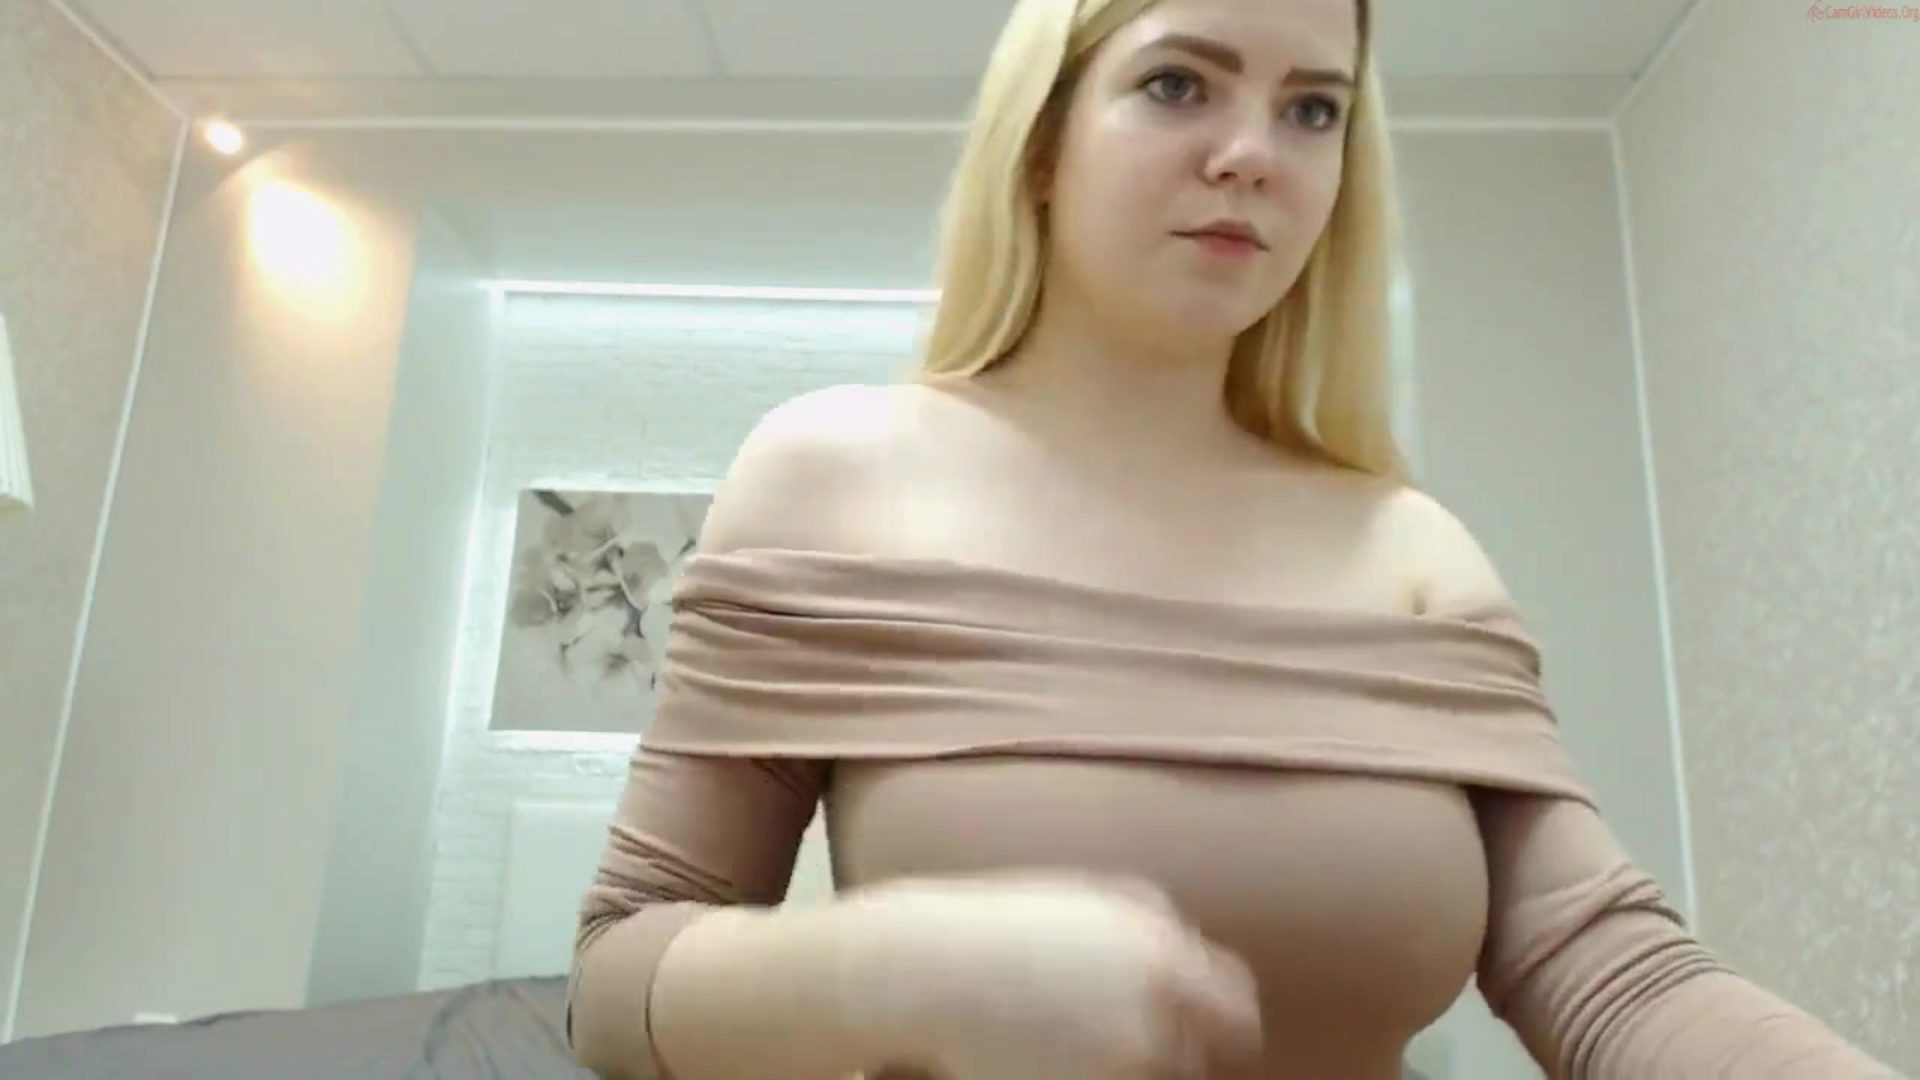 Пьяная Девушка Готова Хд Порно Онлайн